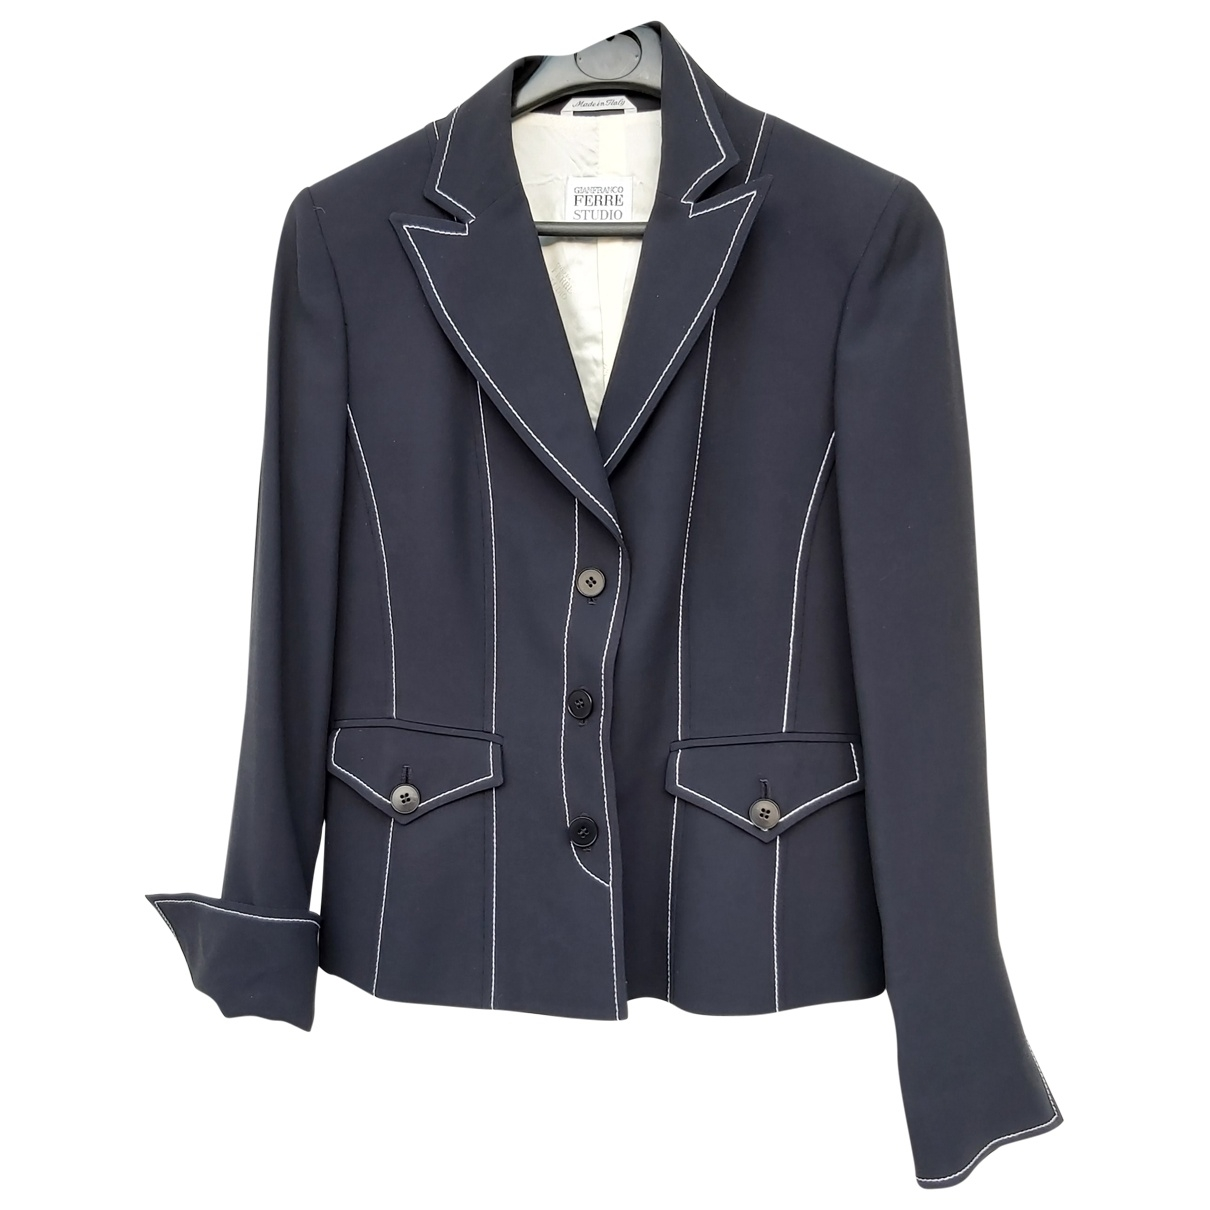 Gianfranco Ferré \N Black jacket for Women 40 FR